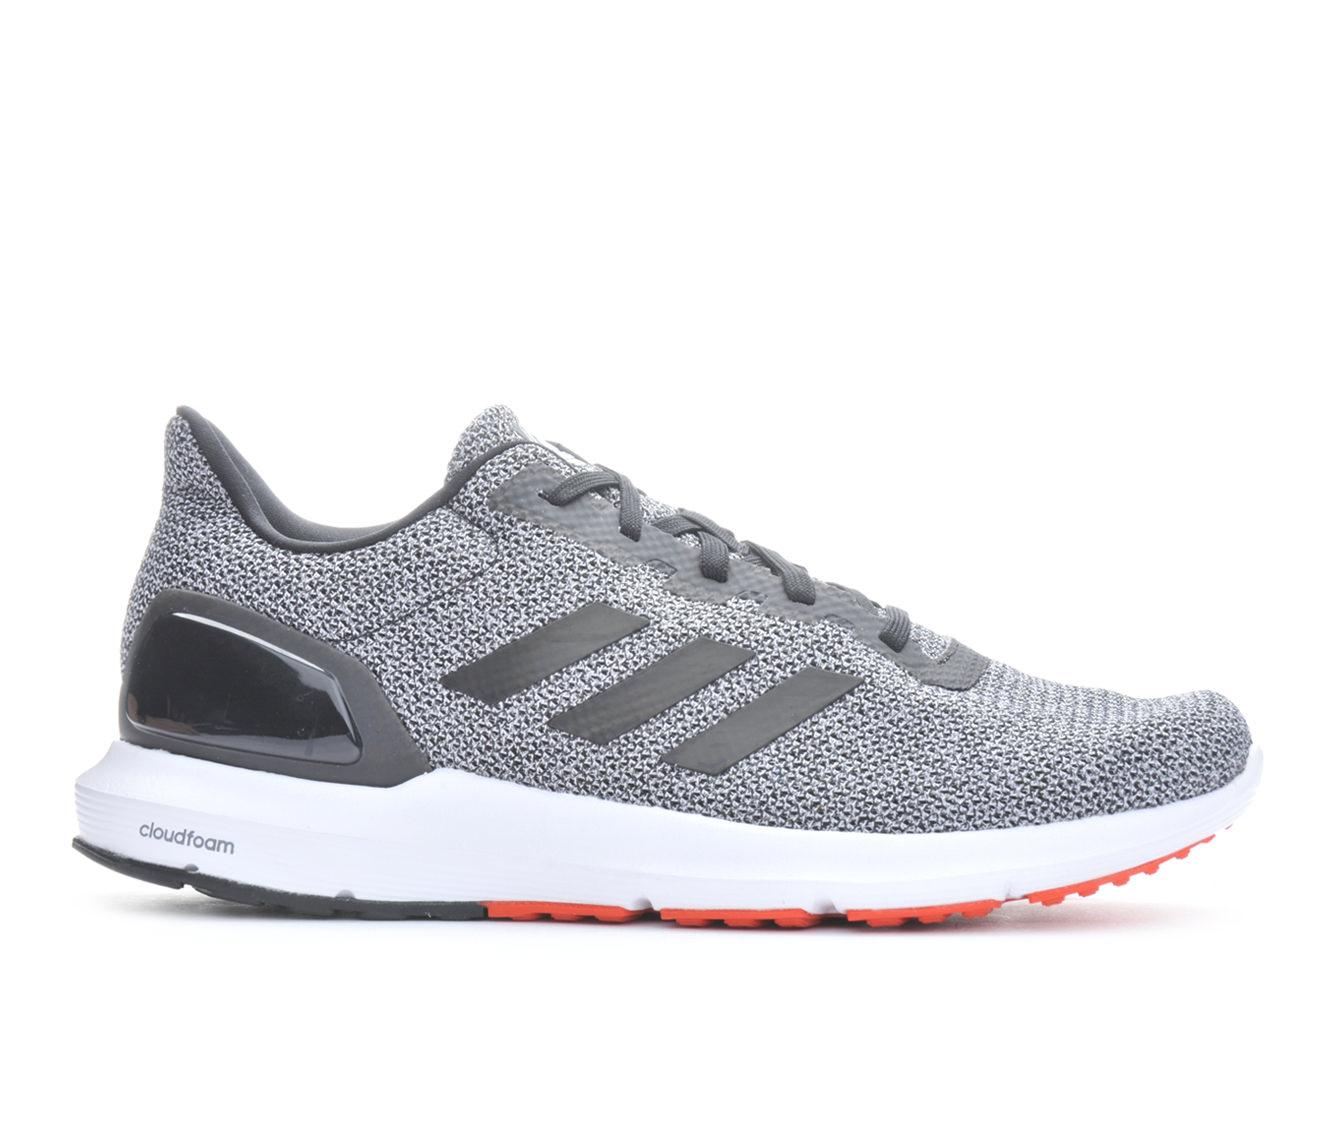 Men's Adidas Cosmic 2 SL Running Shoes (Grey - Size 12) 1655118